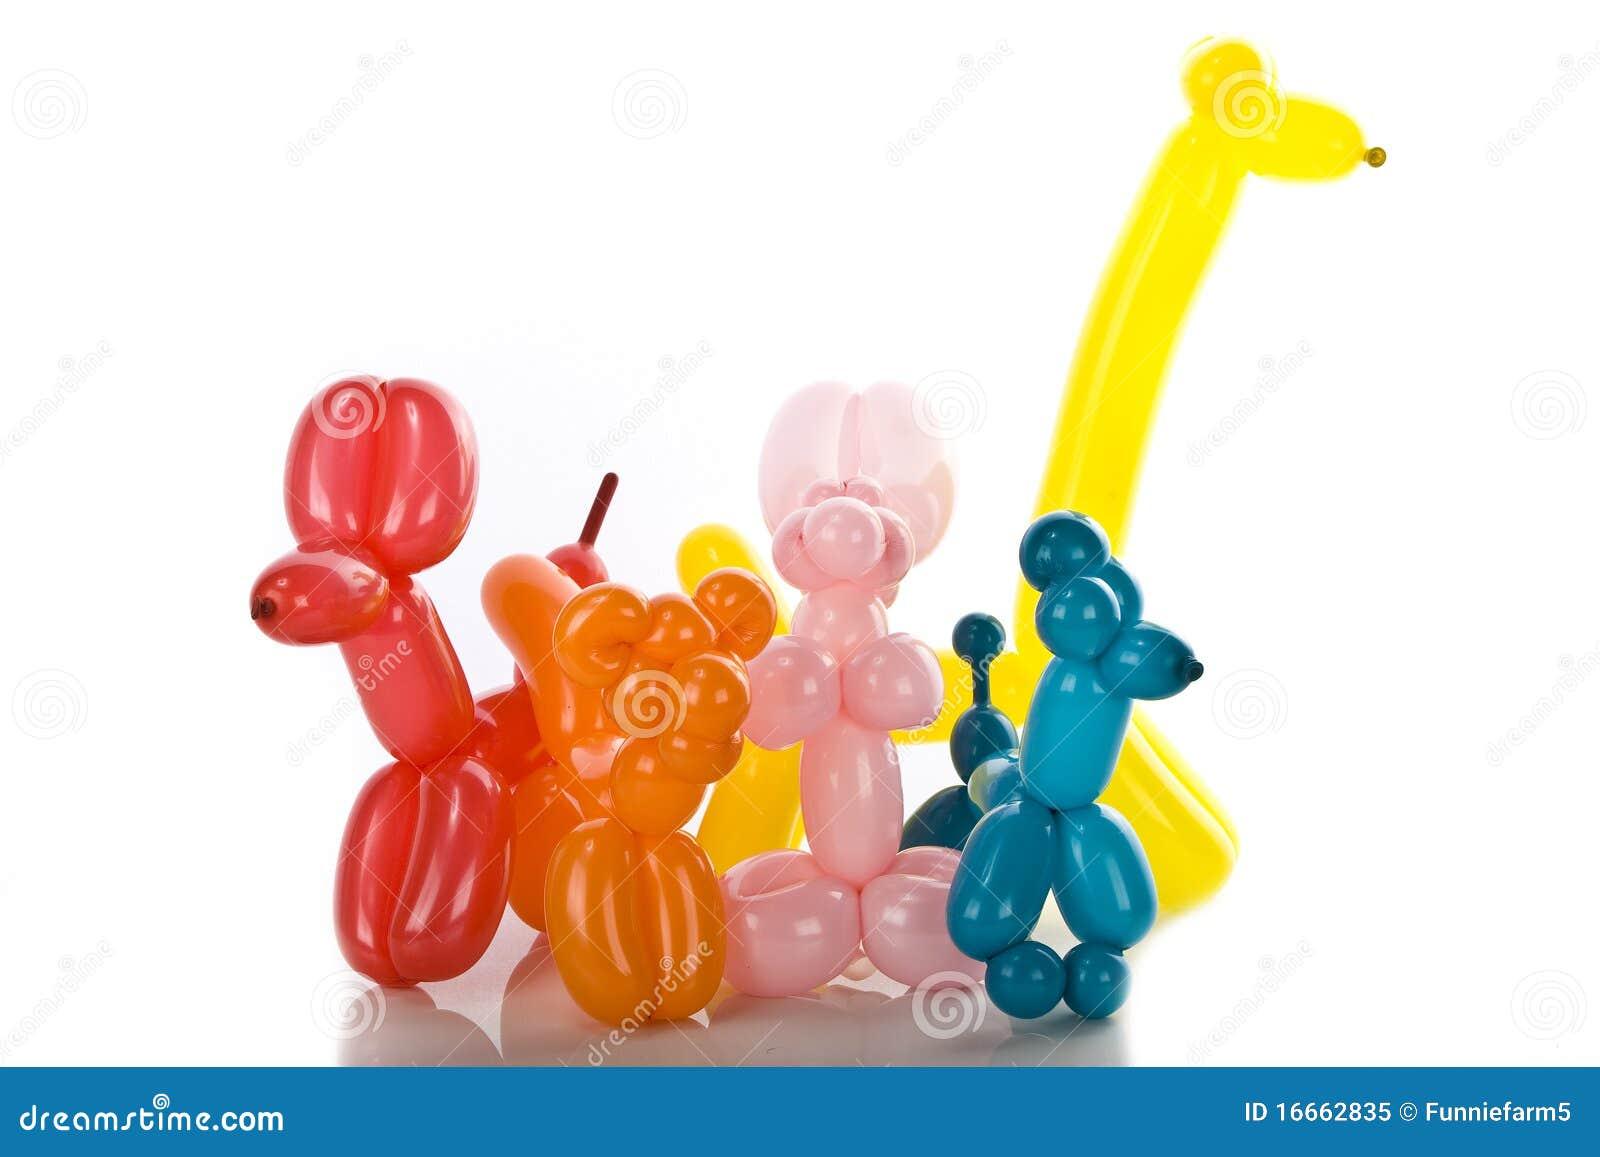 Simple Balloon Animals On White Royalty Free Stock Photo - Image ...